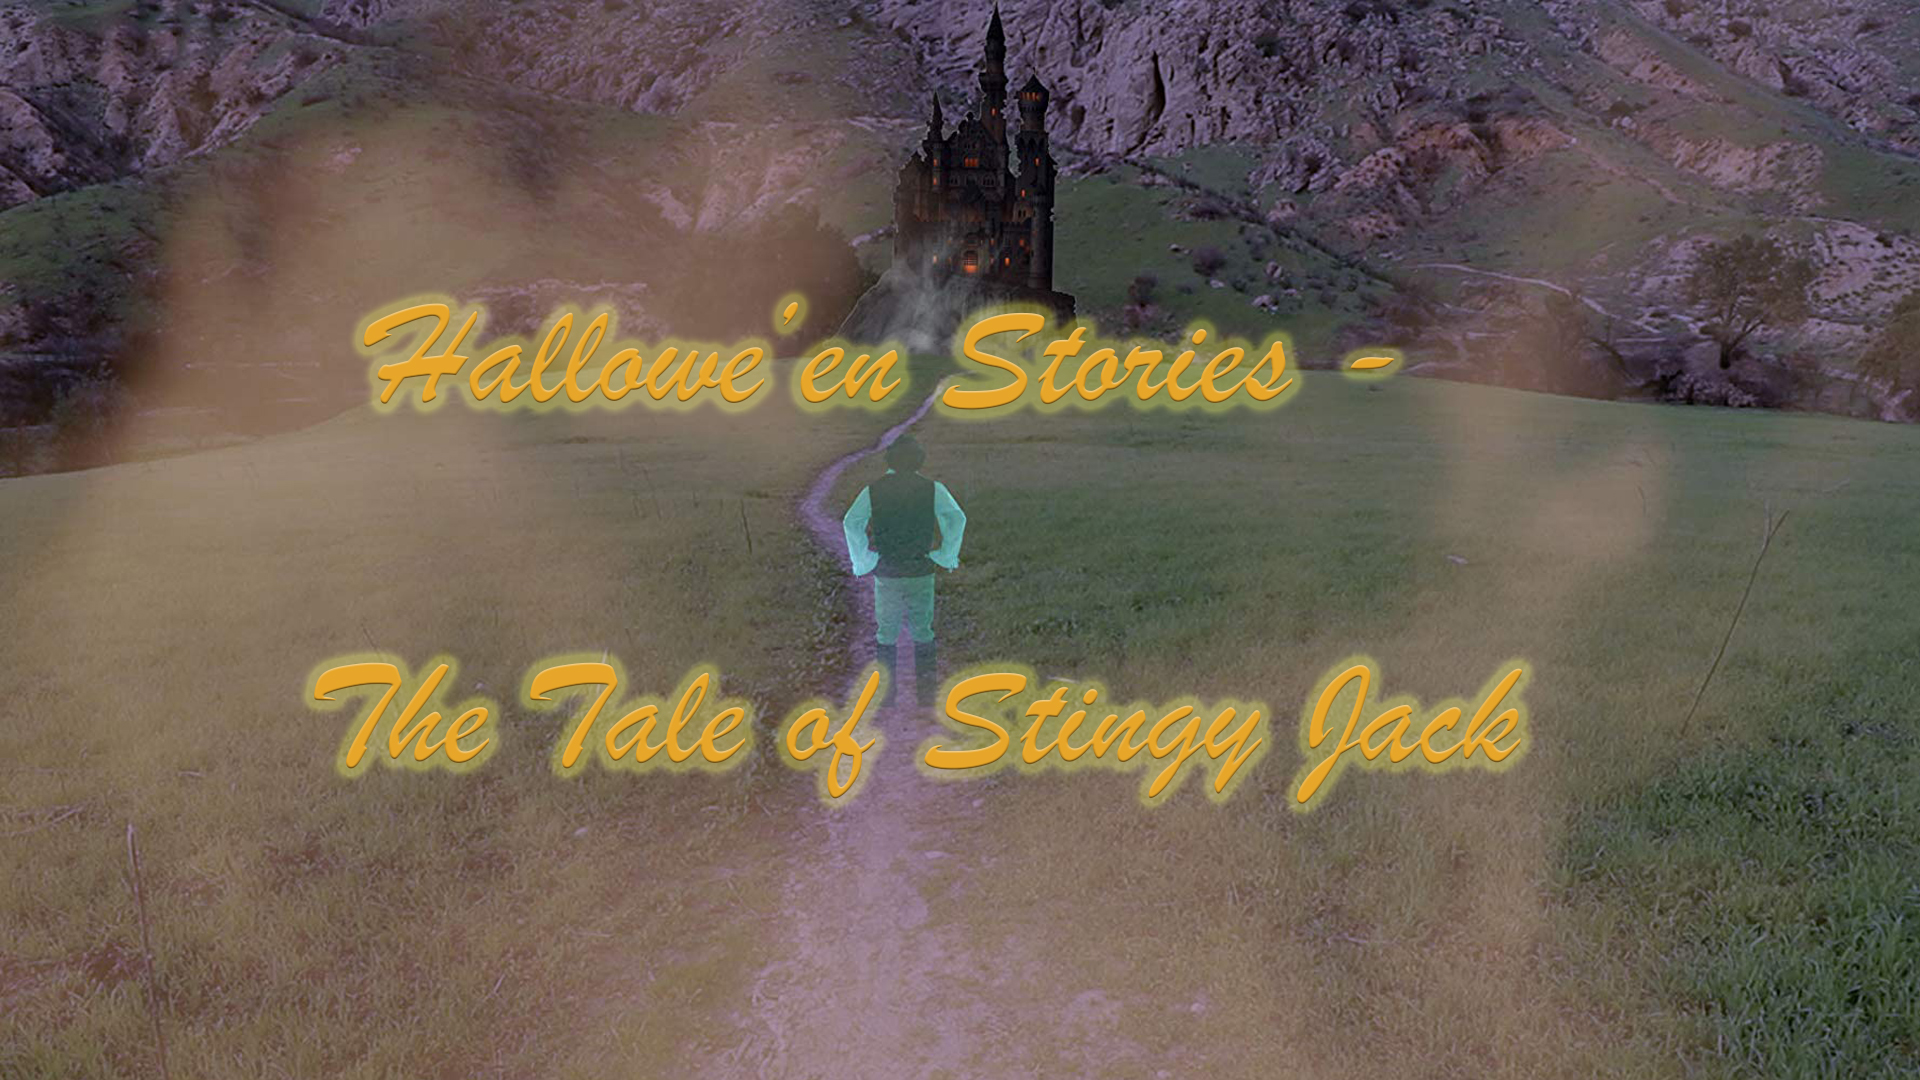 Hallowe'en Stories - The Tale of Stingy Jack